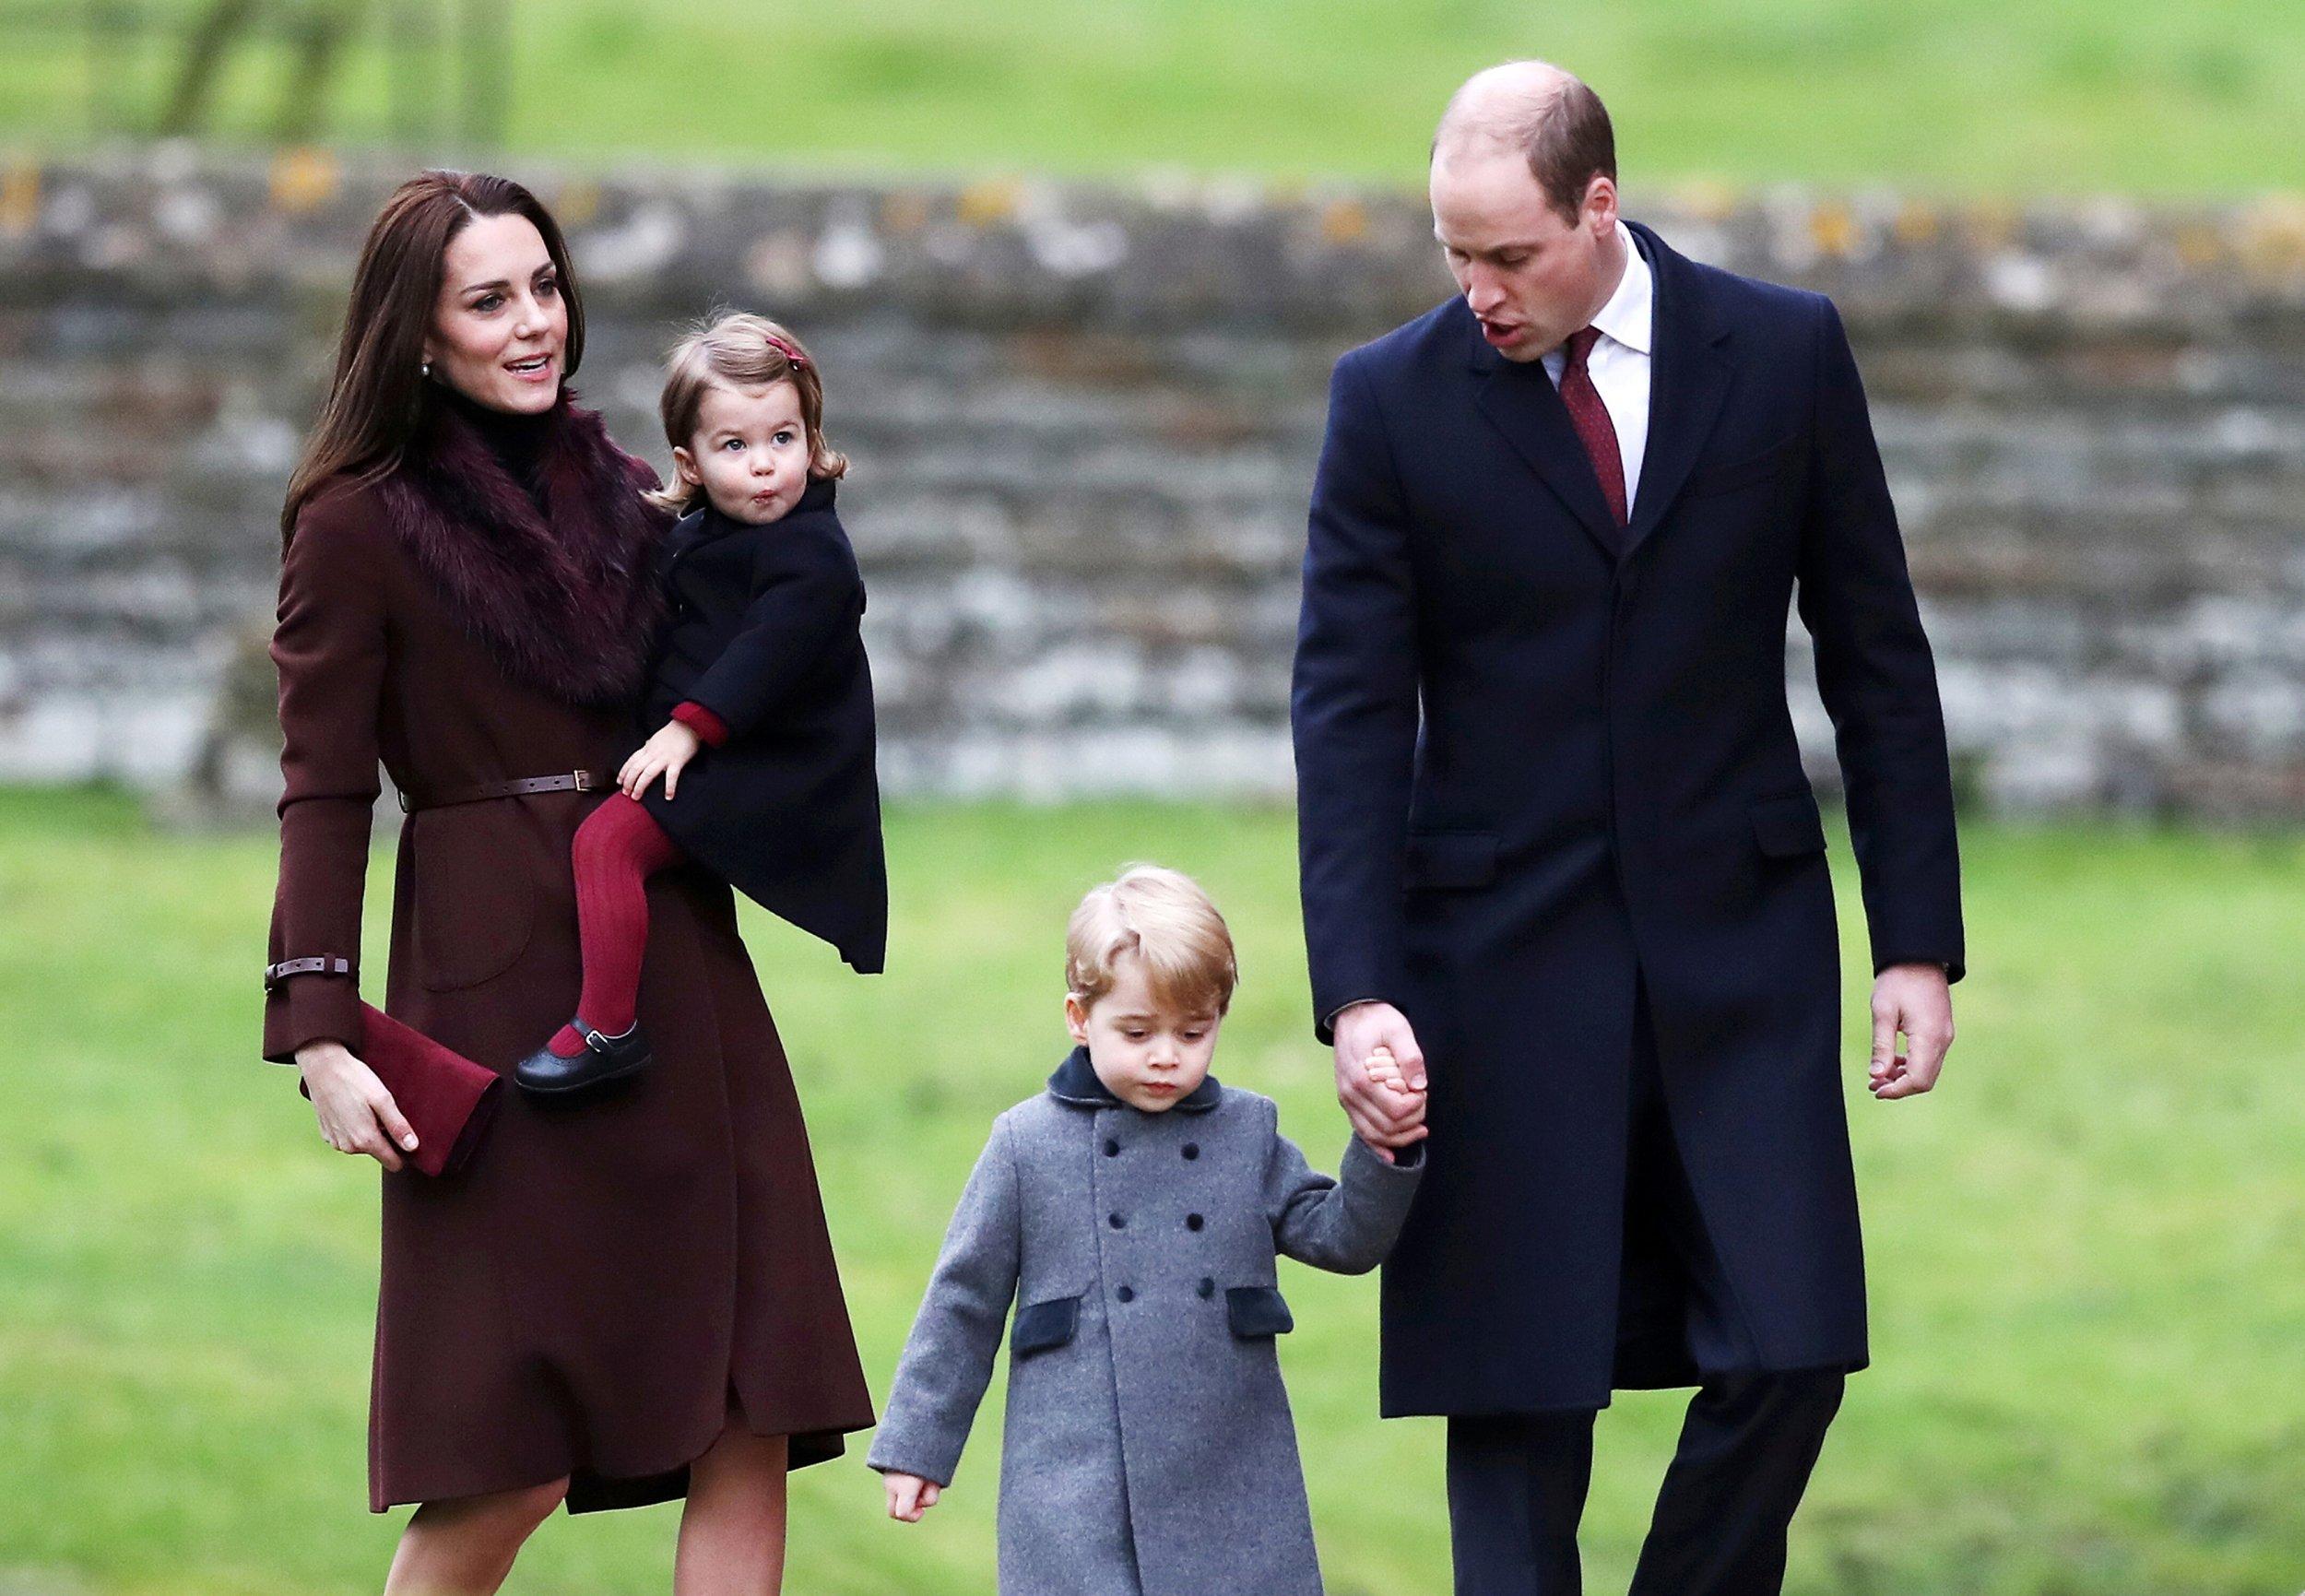 ad91737c7 Prince William and Kate Middleton Take Prince George and Princess ...